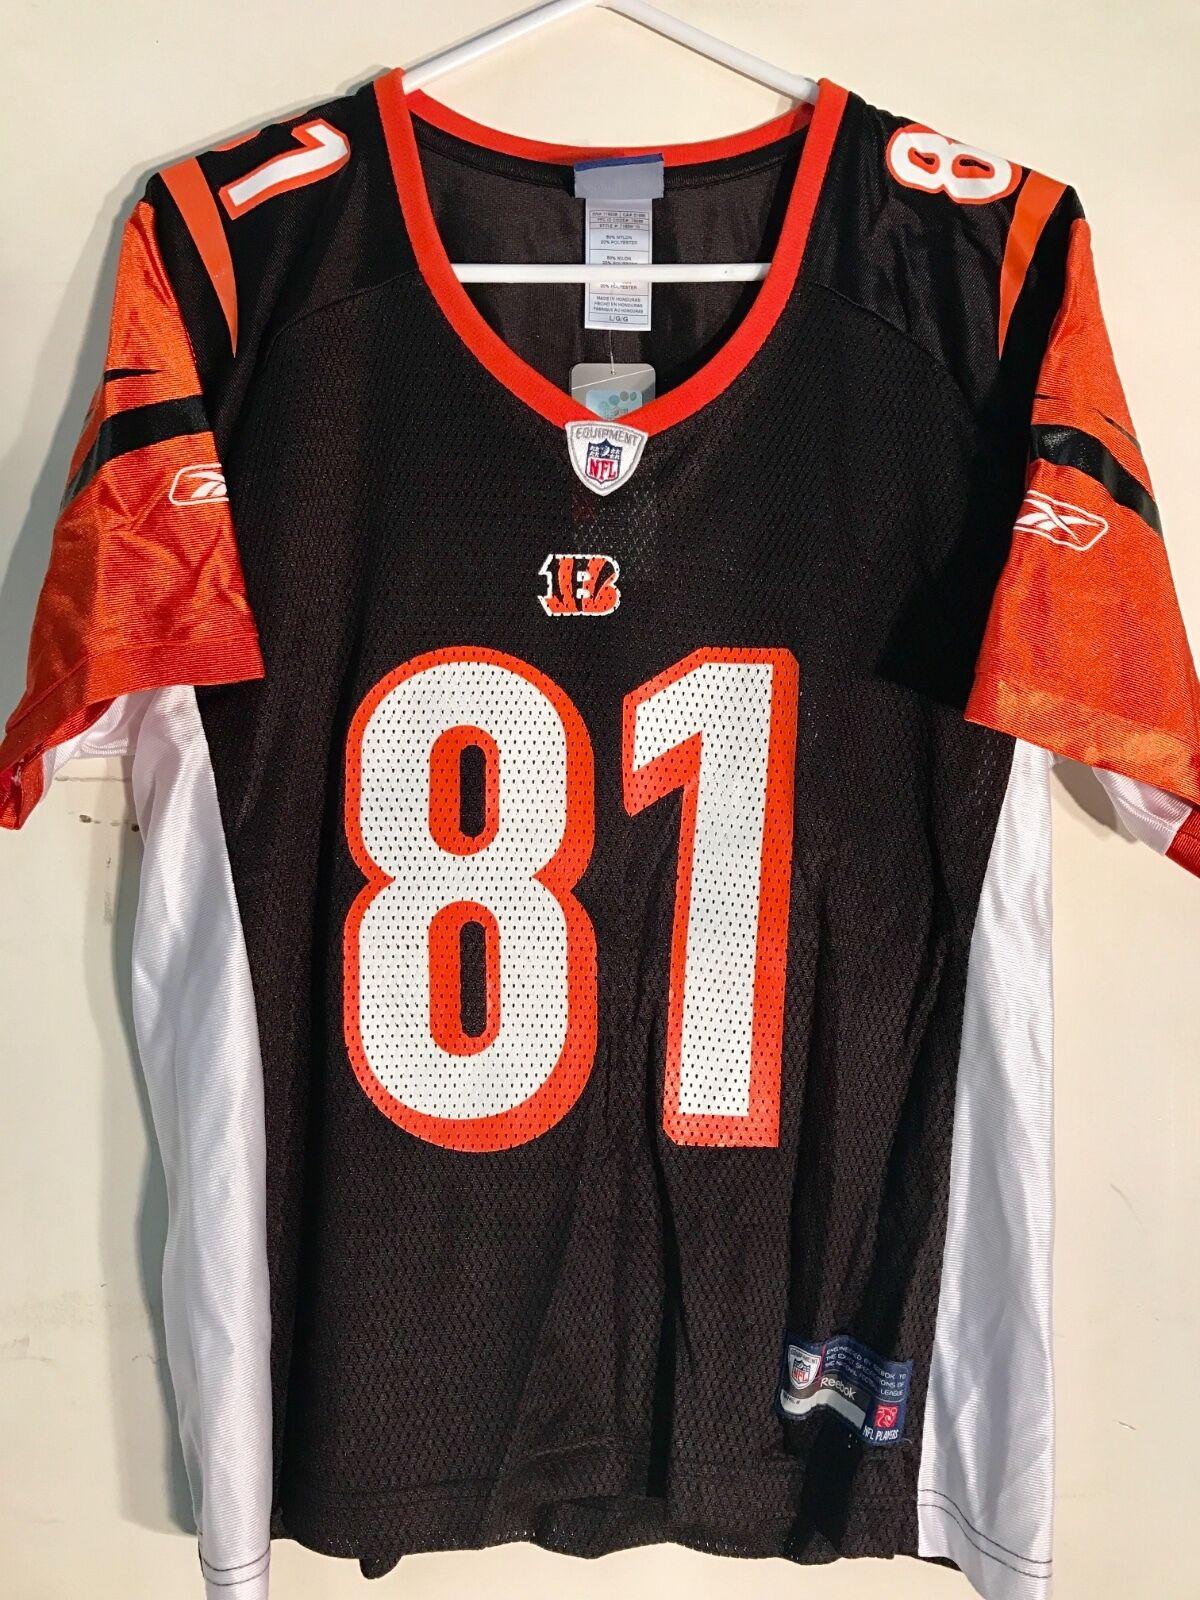 fe990b9e4b7 Reebok Women s NFL Jersey Bengals Terrell Owens Black Sz L